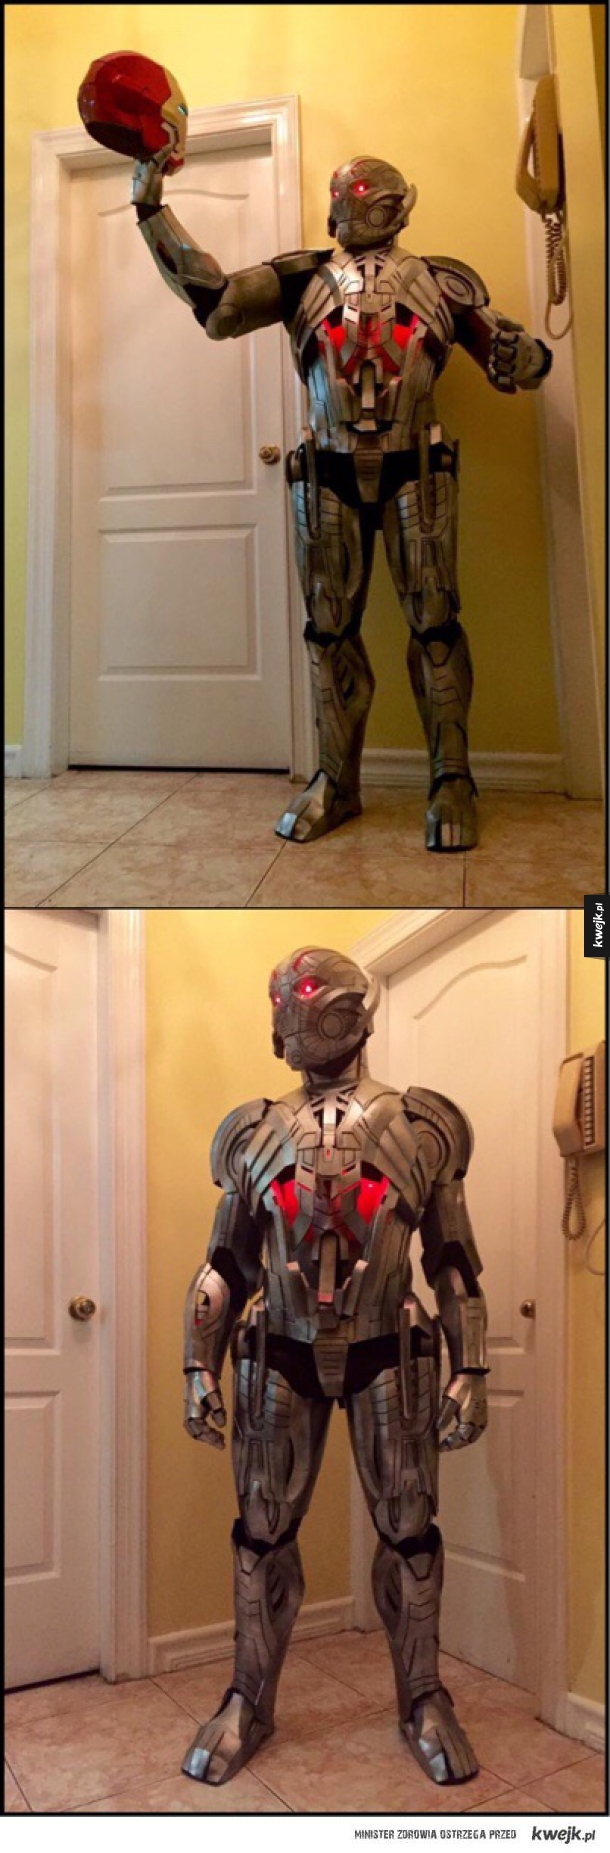 Ultron cosplay